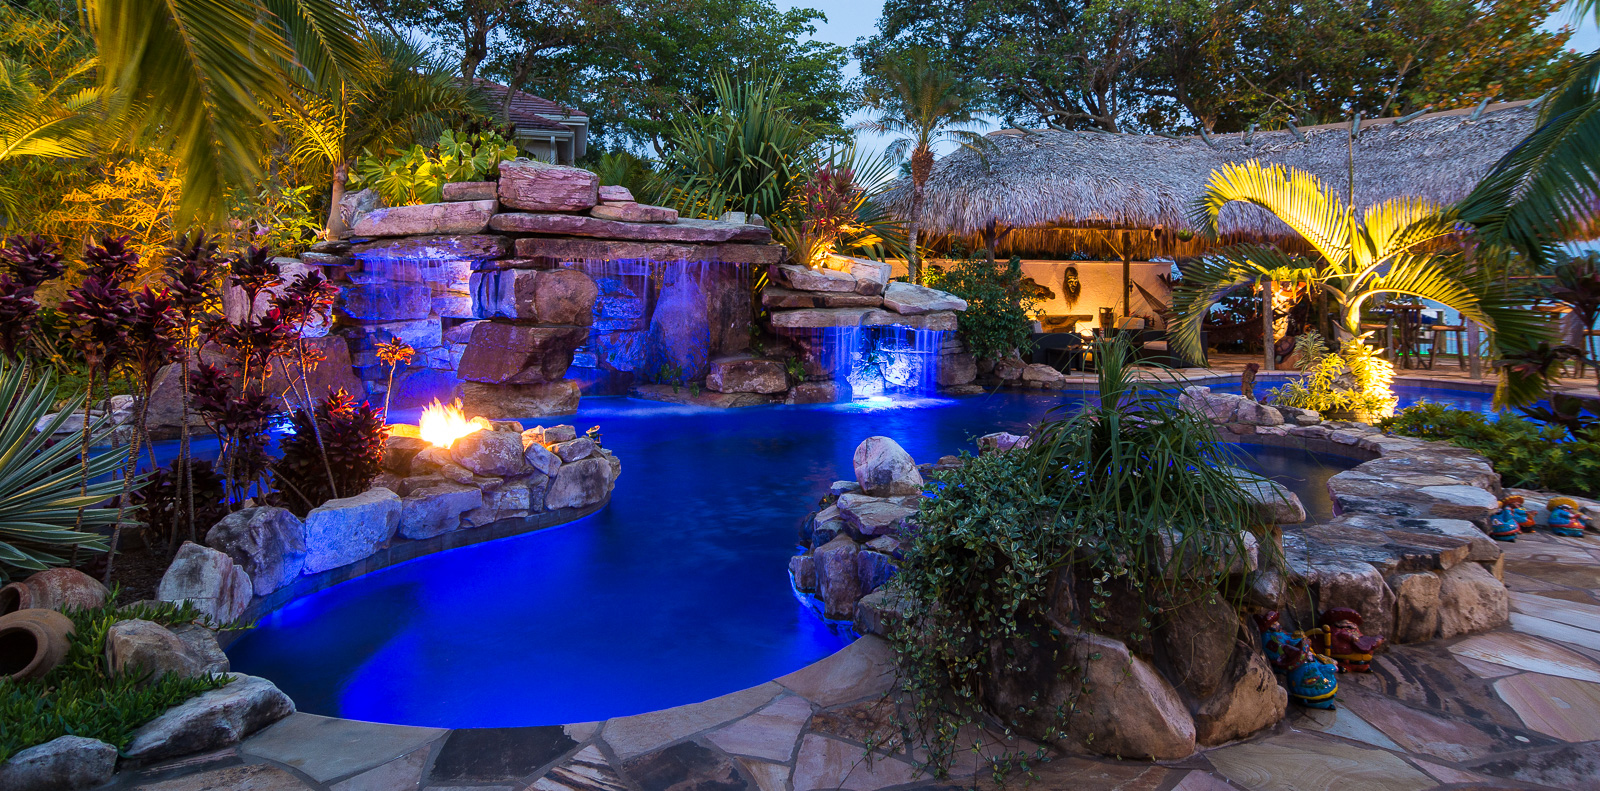 Custom rock waterfall pool grotto spa natural stream - Best home swimming pools ...